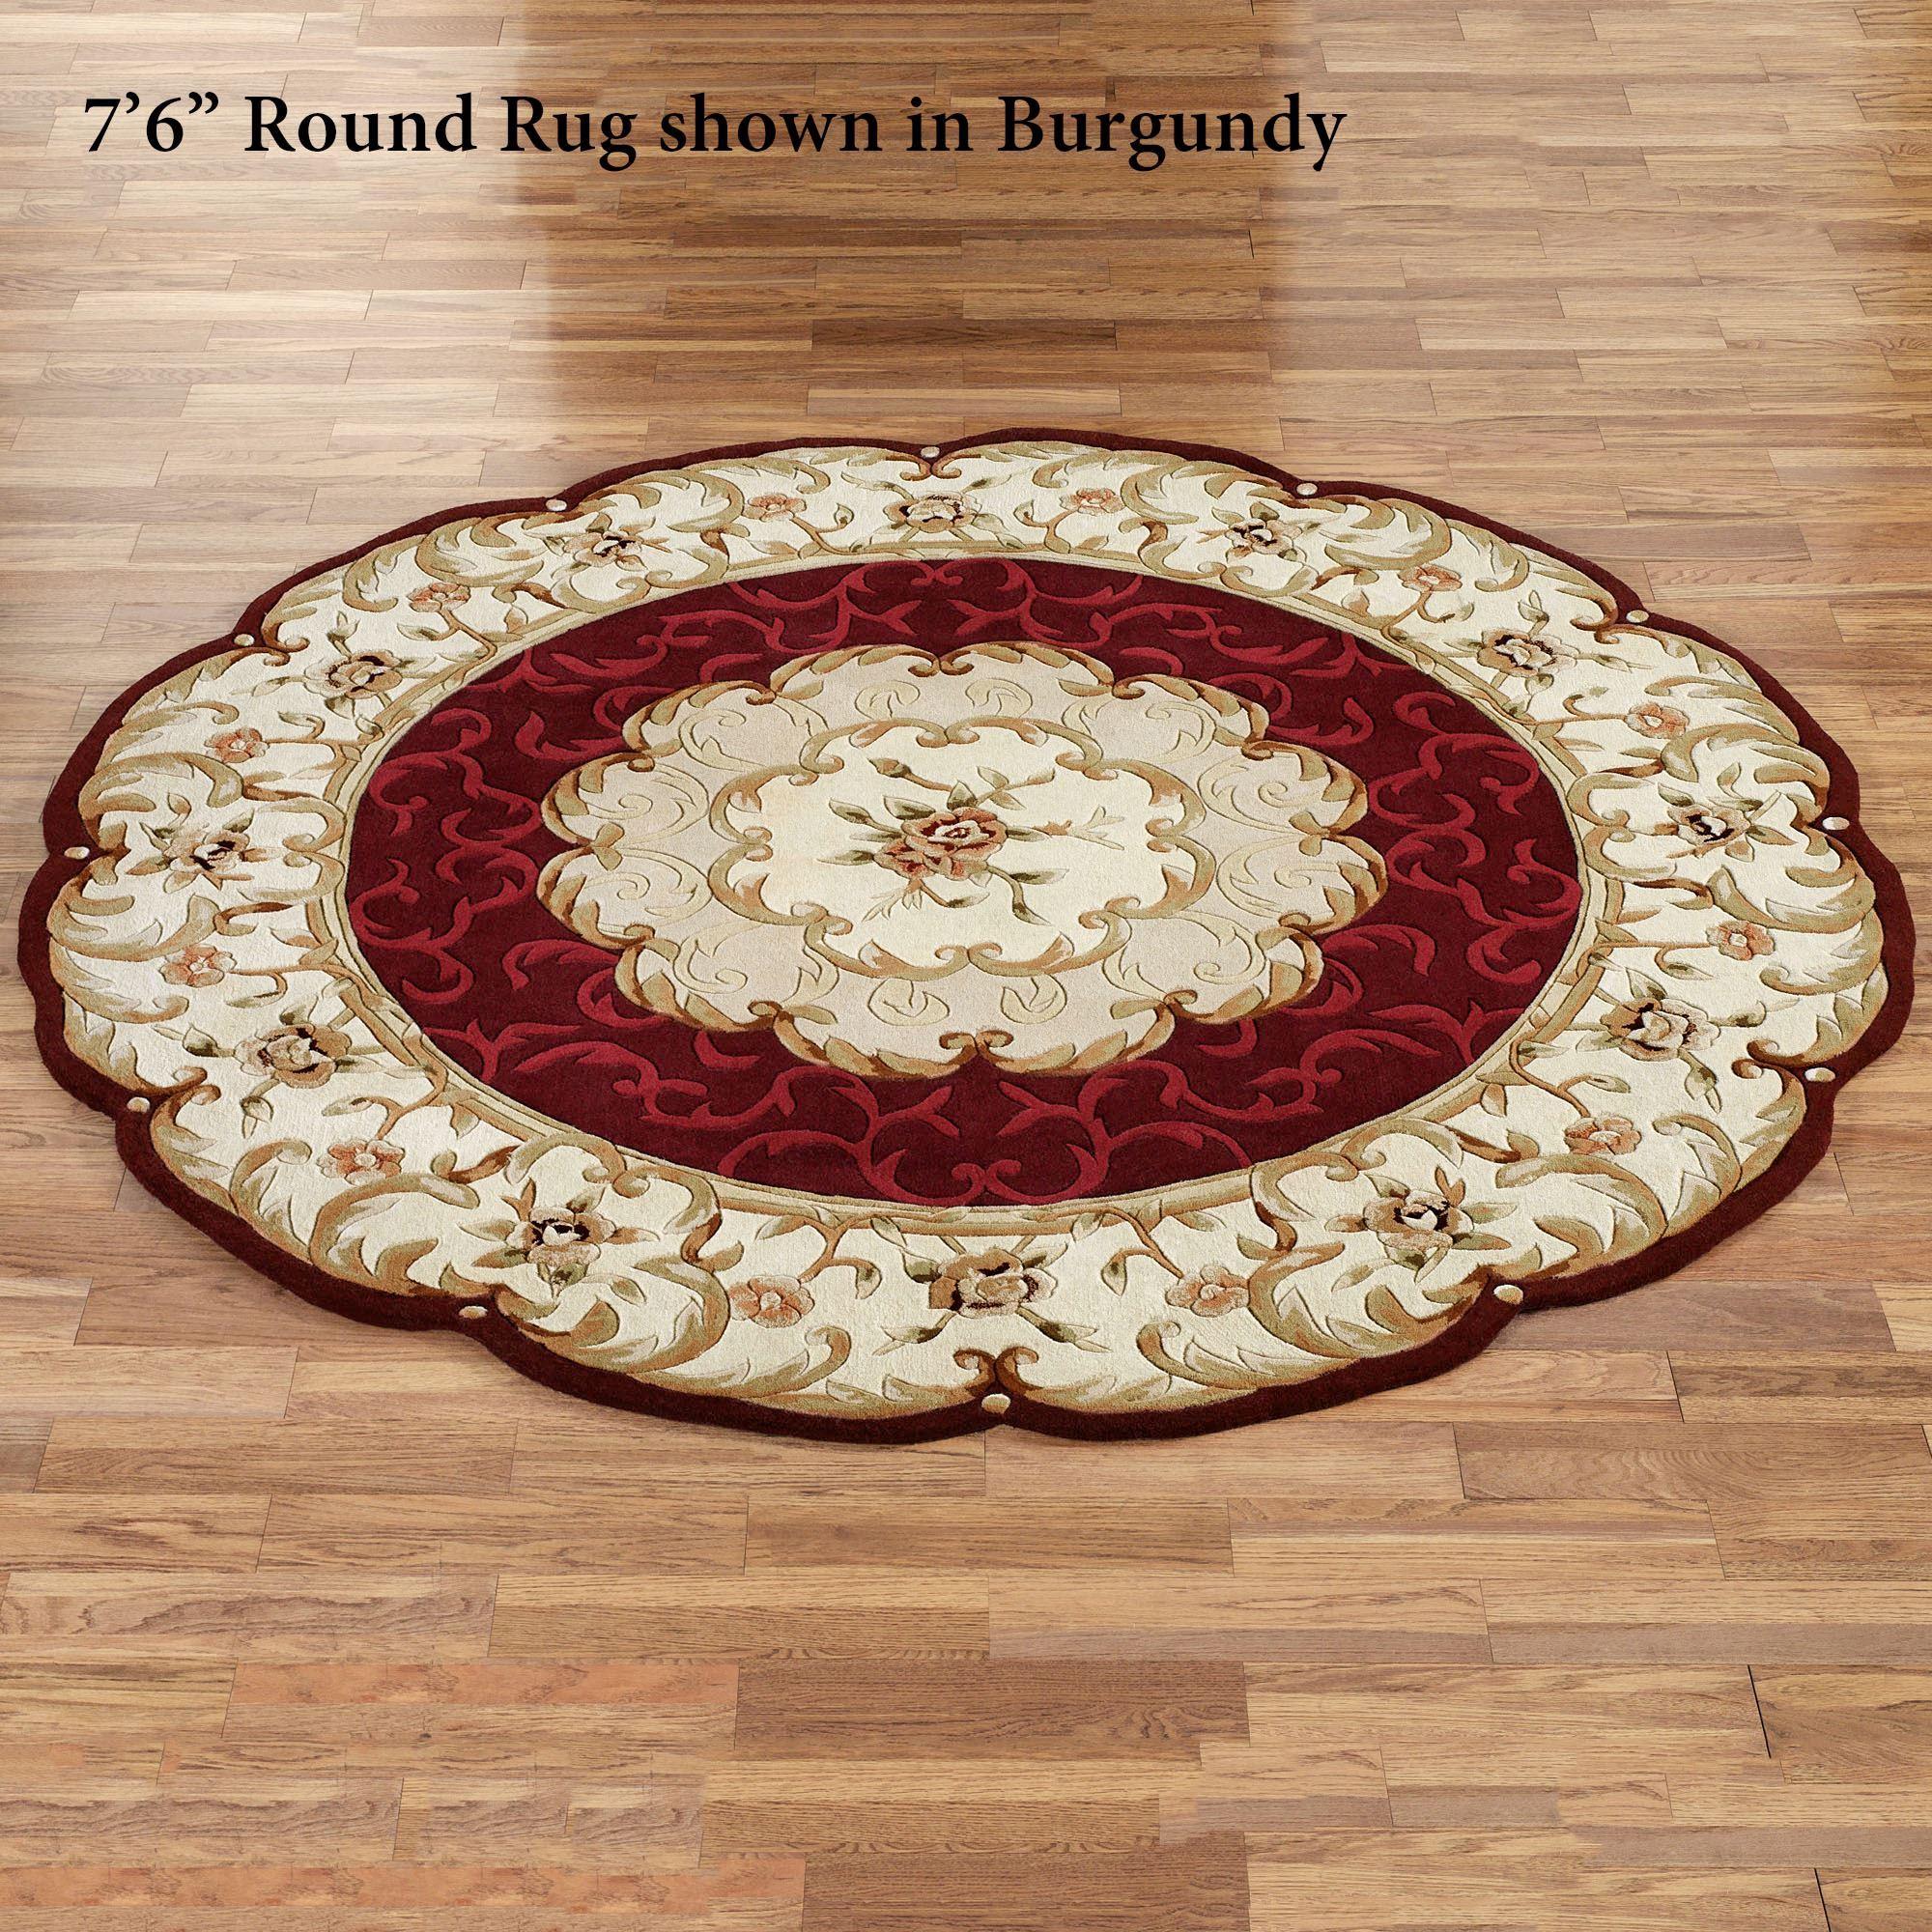 Cool Evaline Round Rug 6 foot round rug